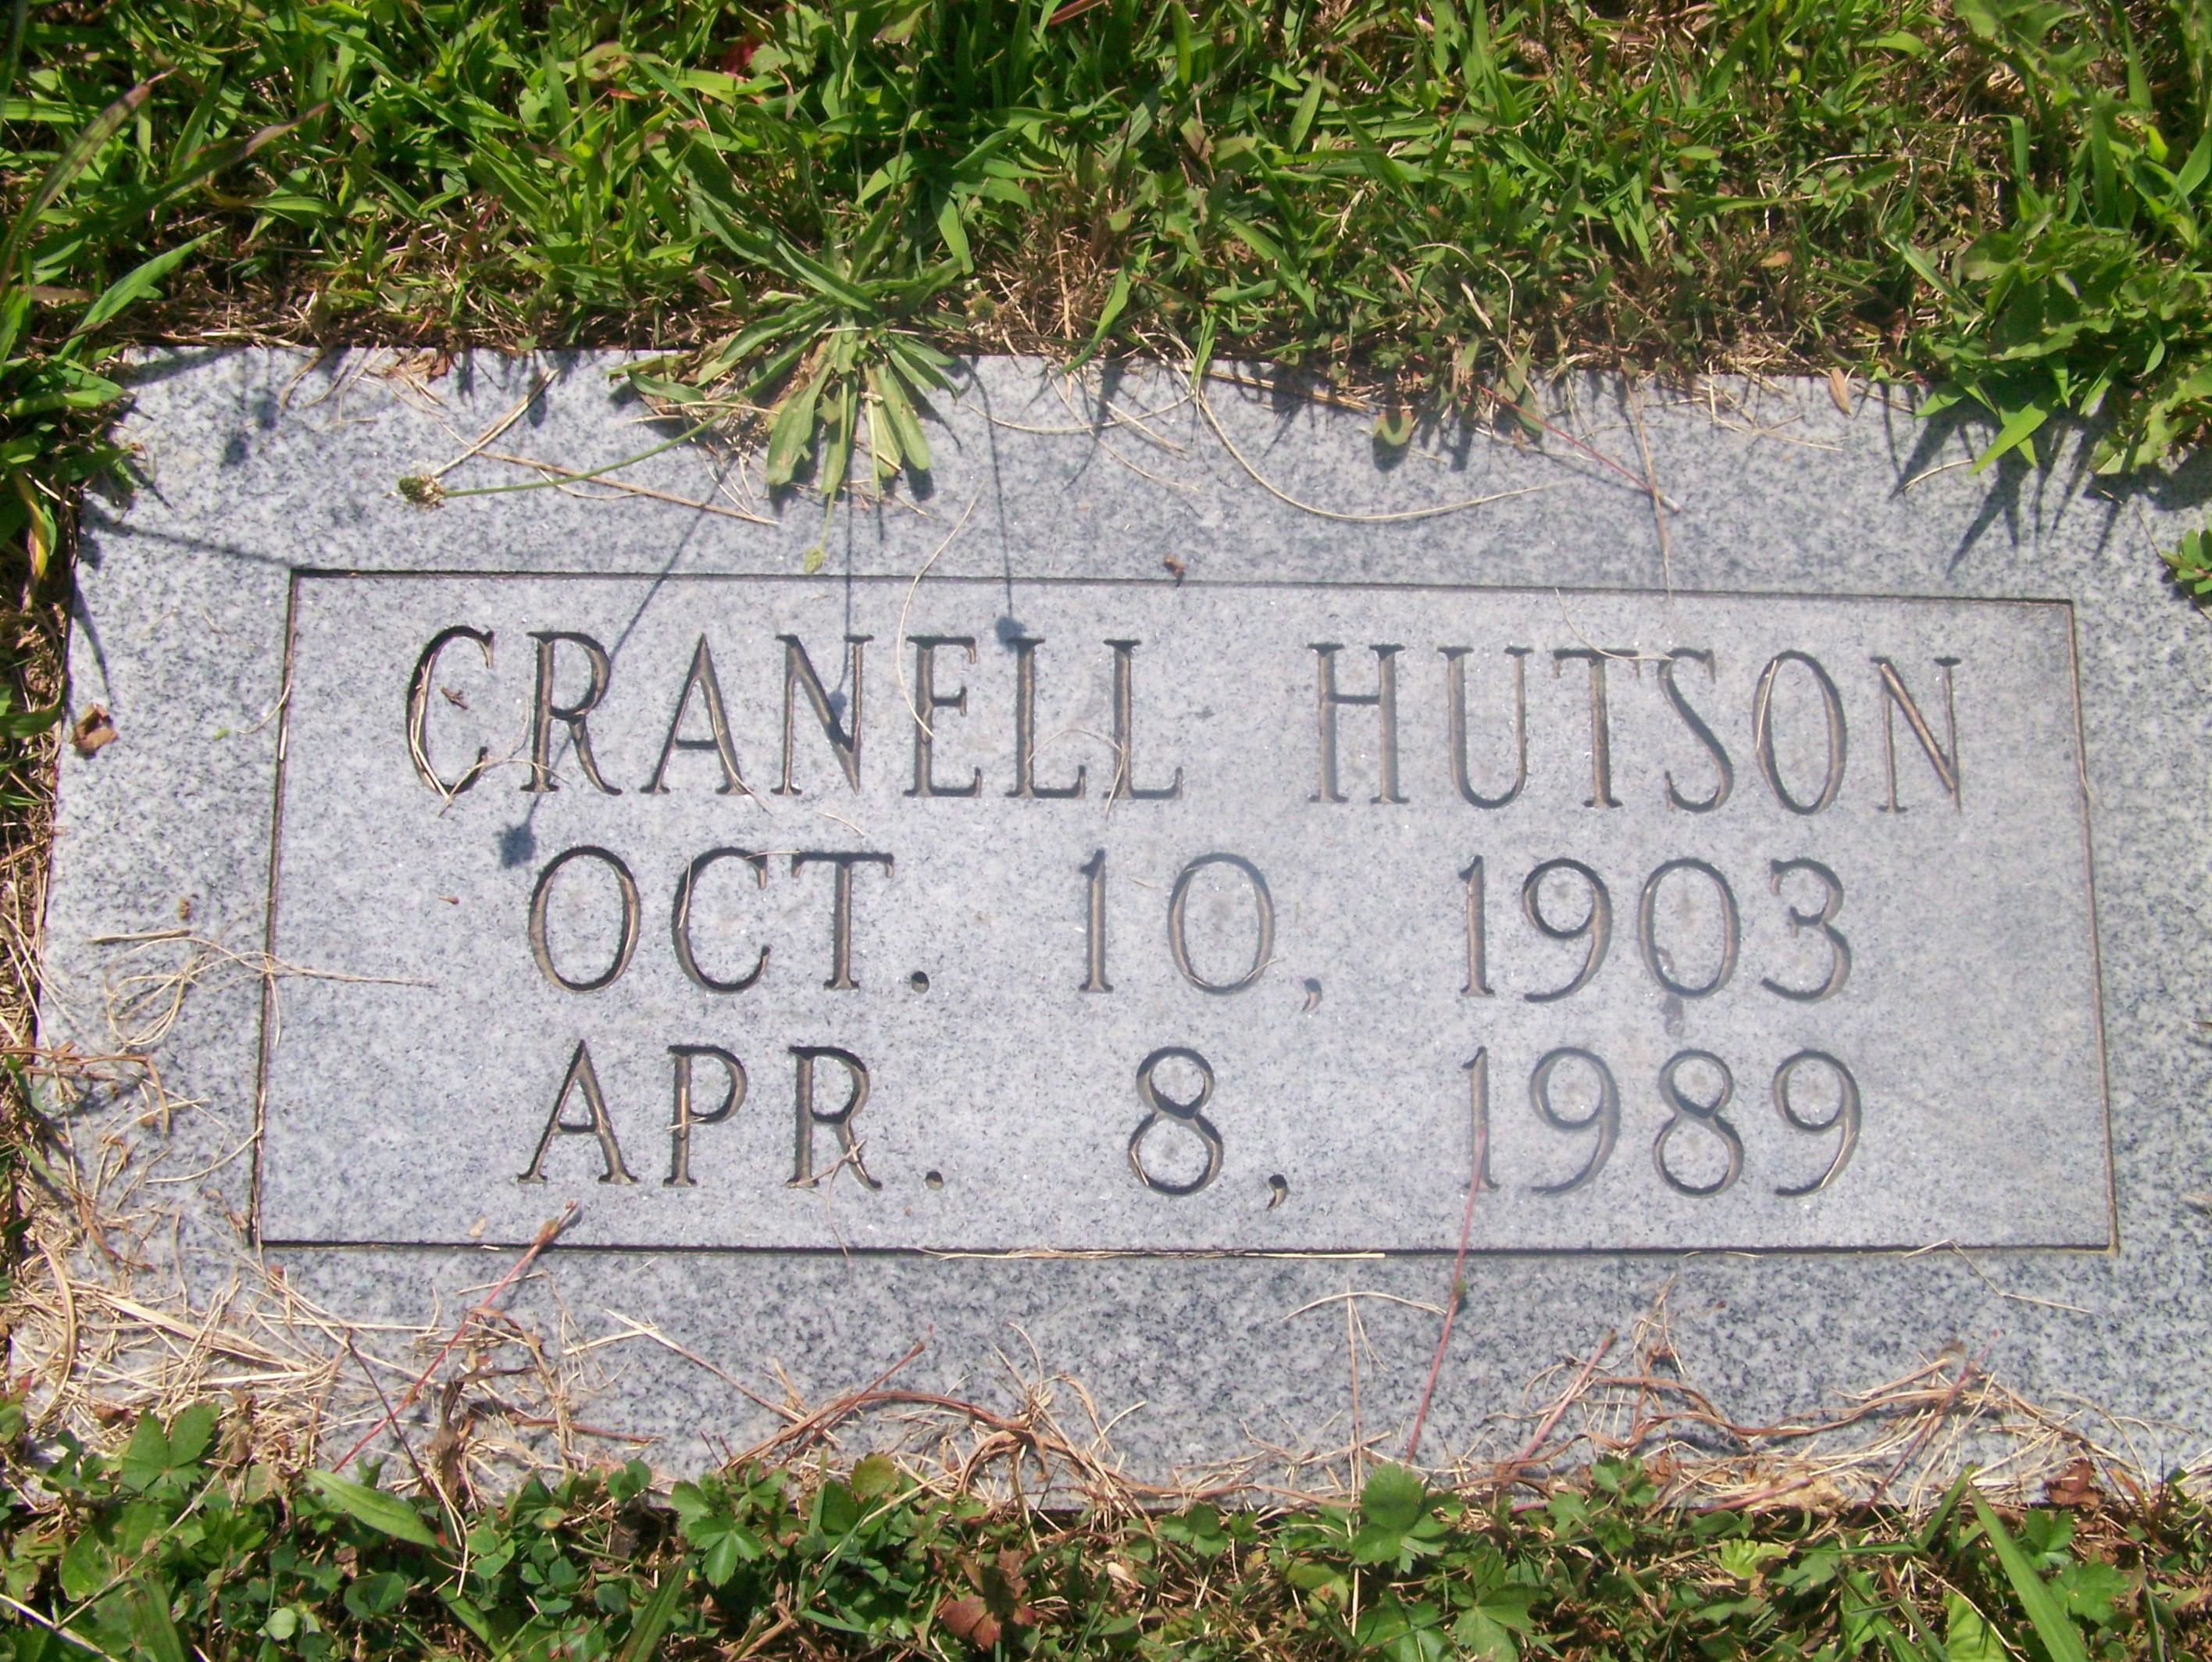 Cranell C. Hutson